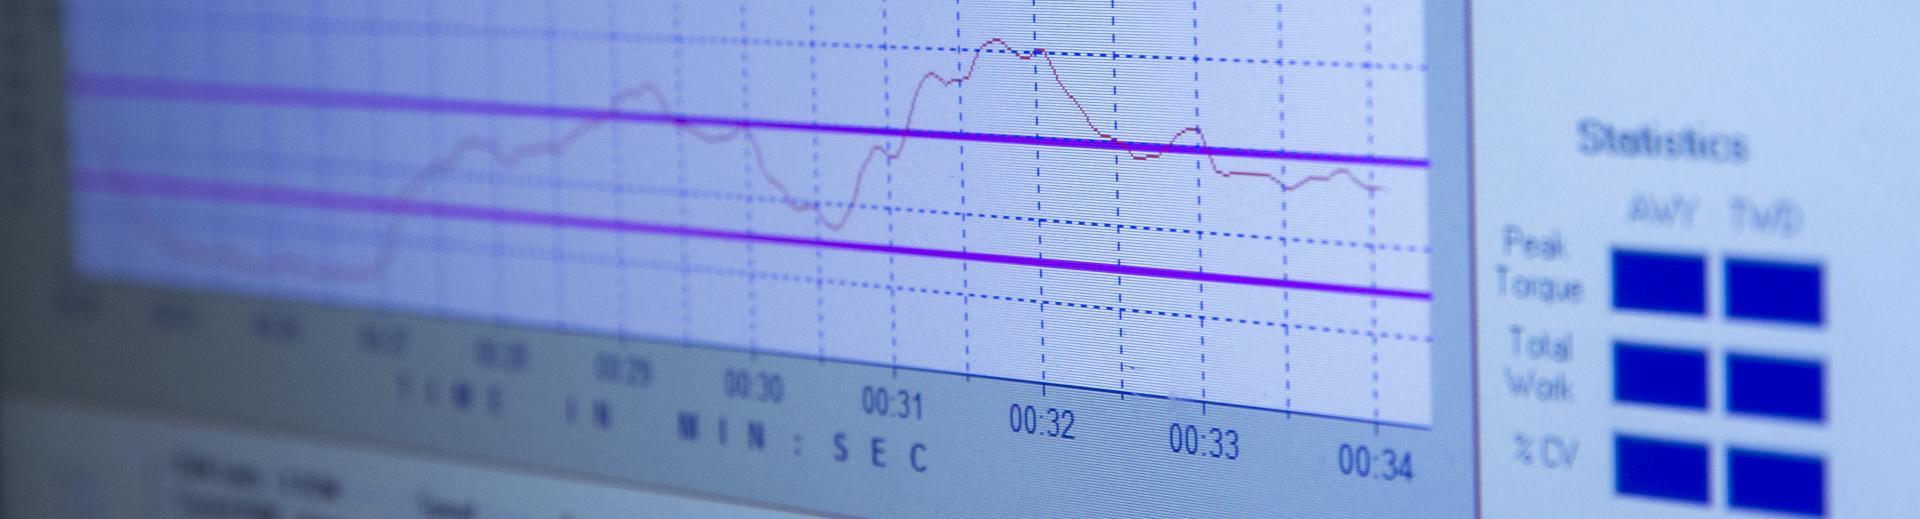 health data on a screen